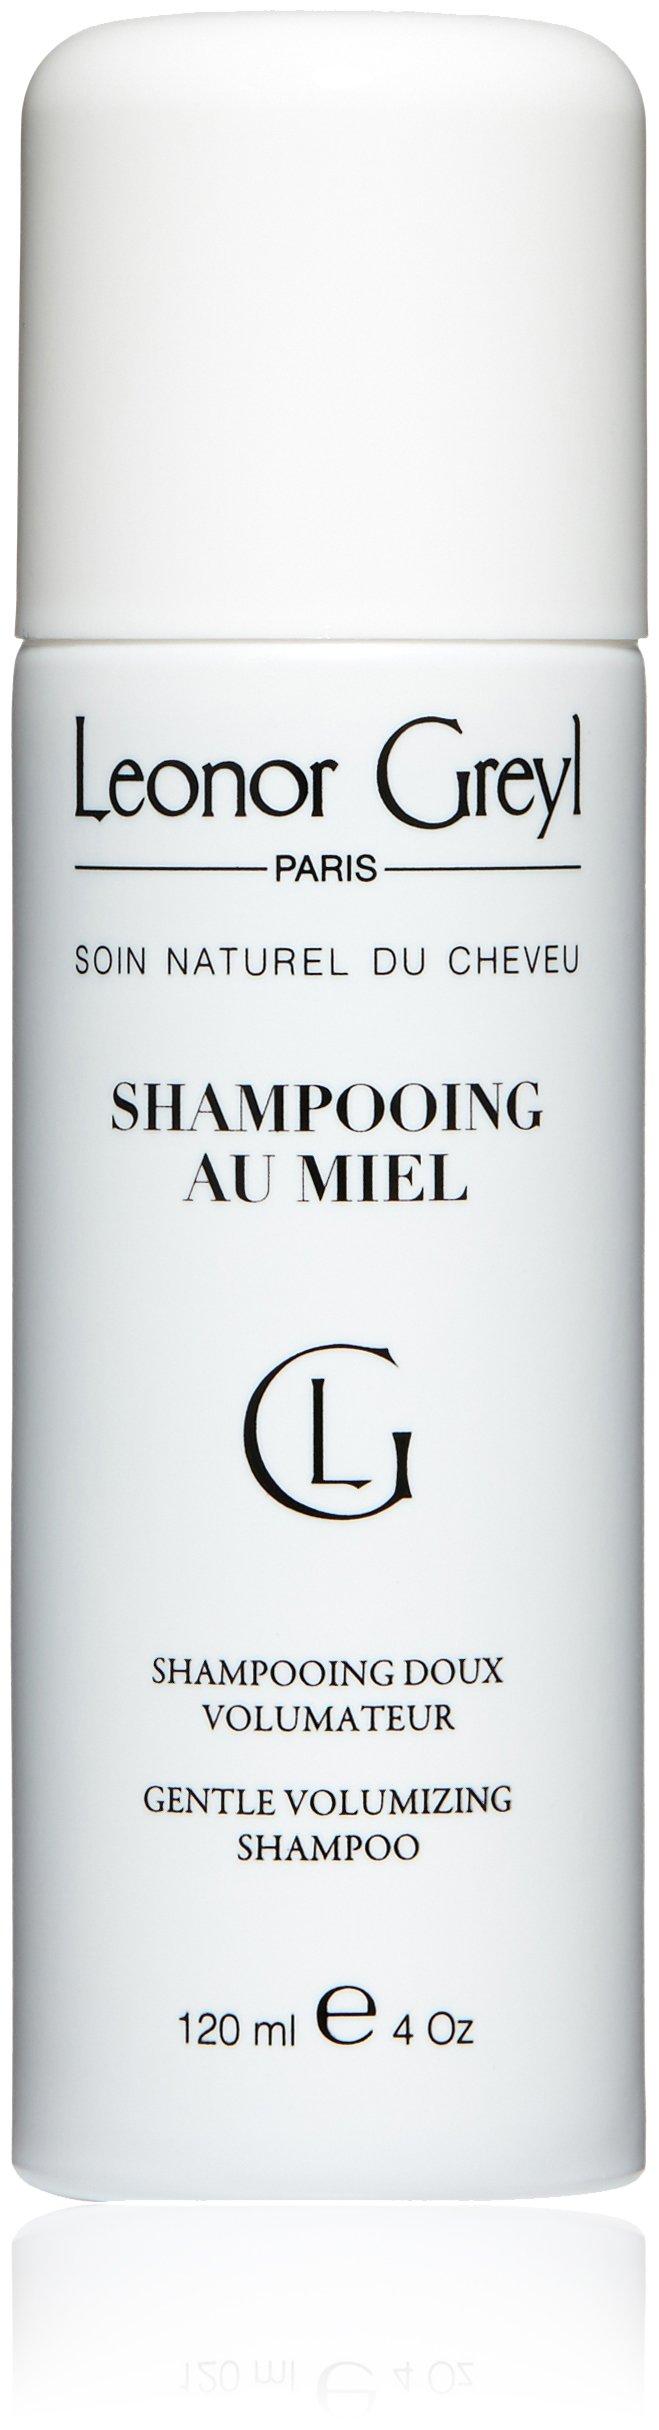 Leonor Greyl Paris Shampooing Au Miel, 4 Oz